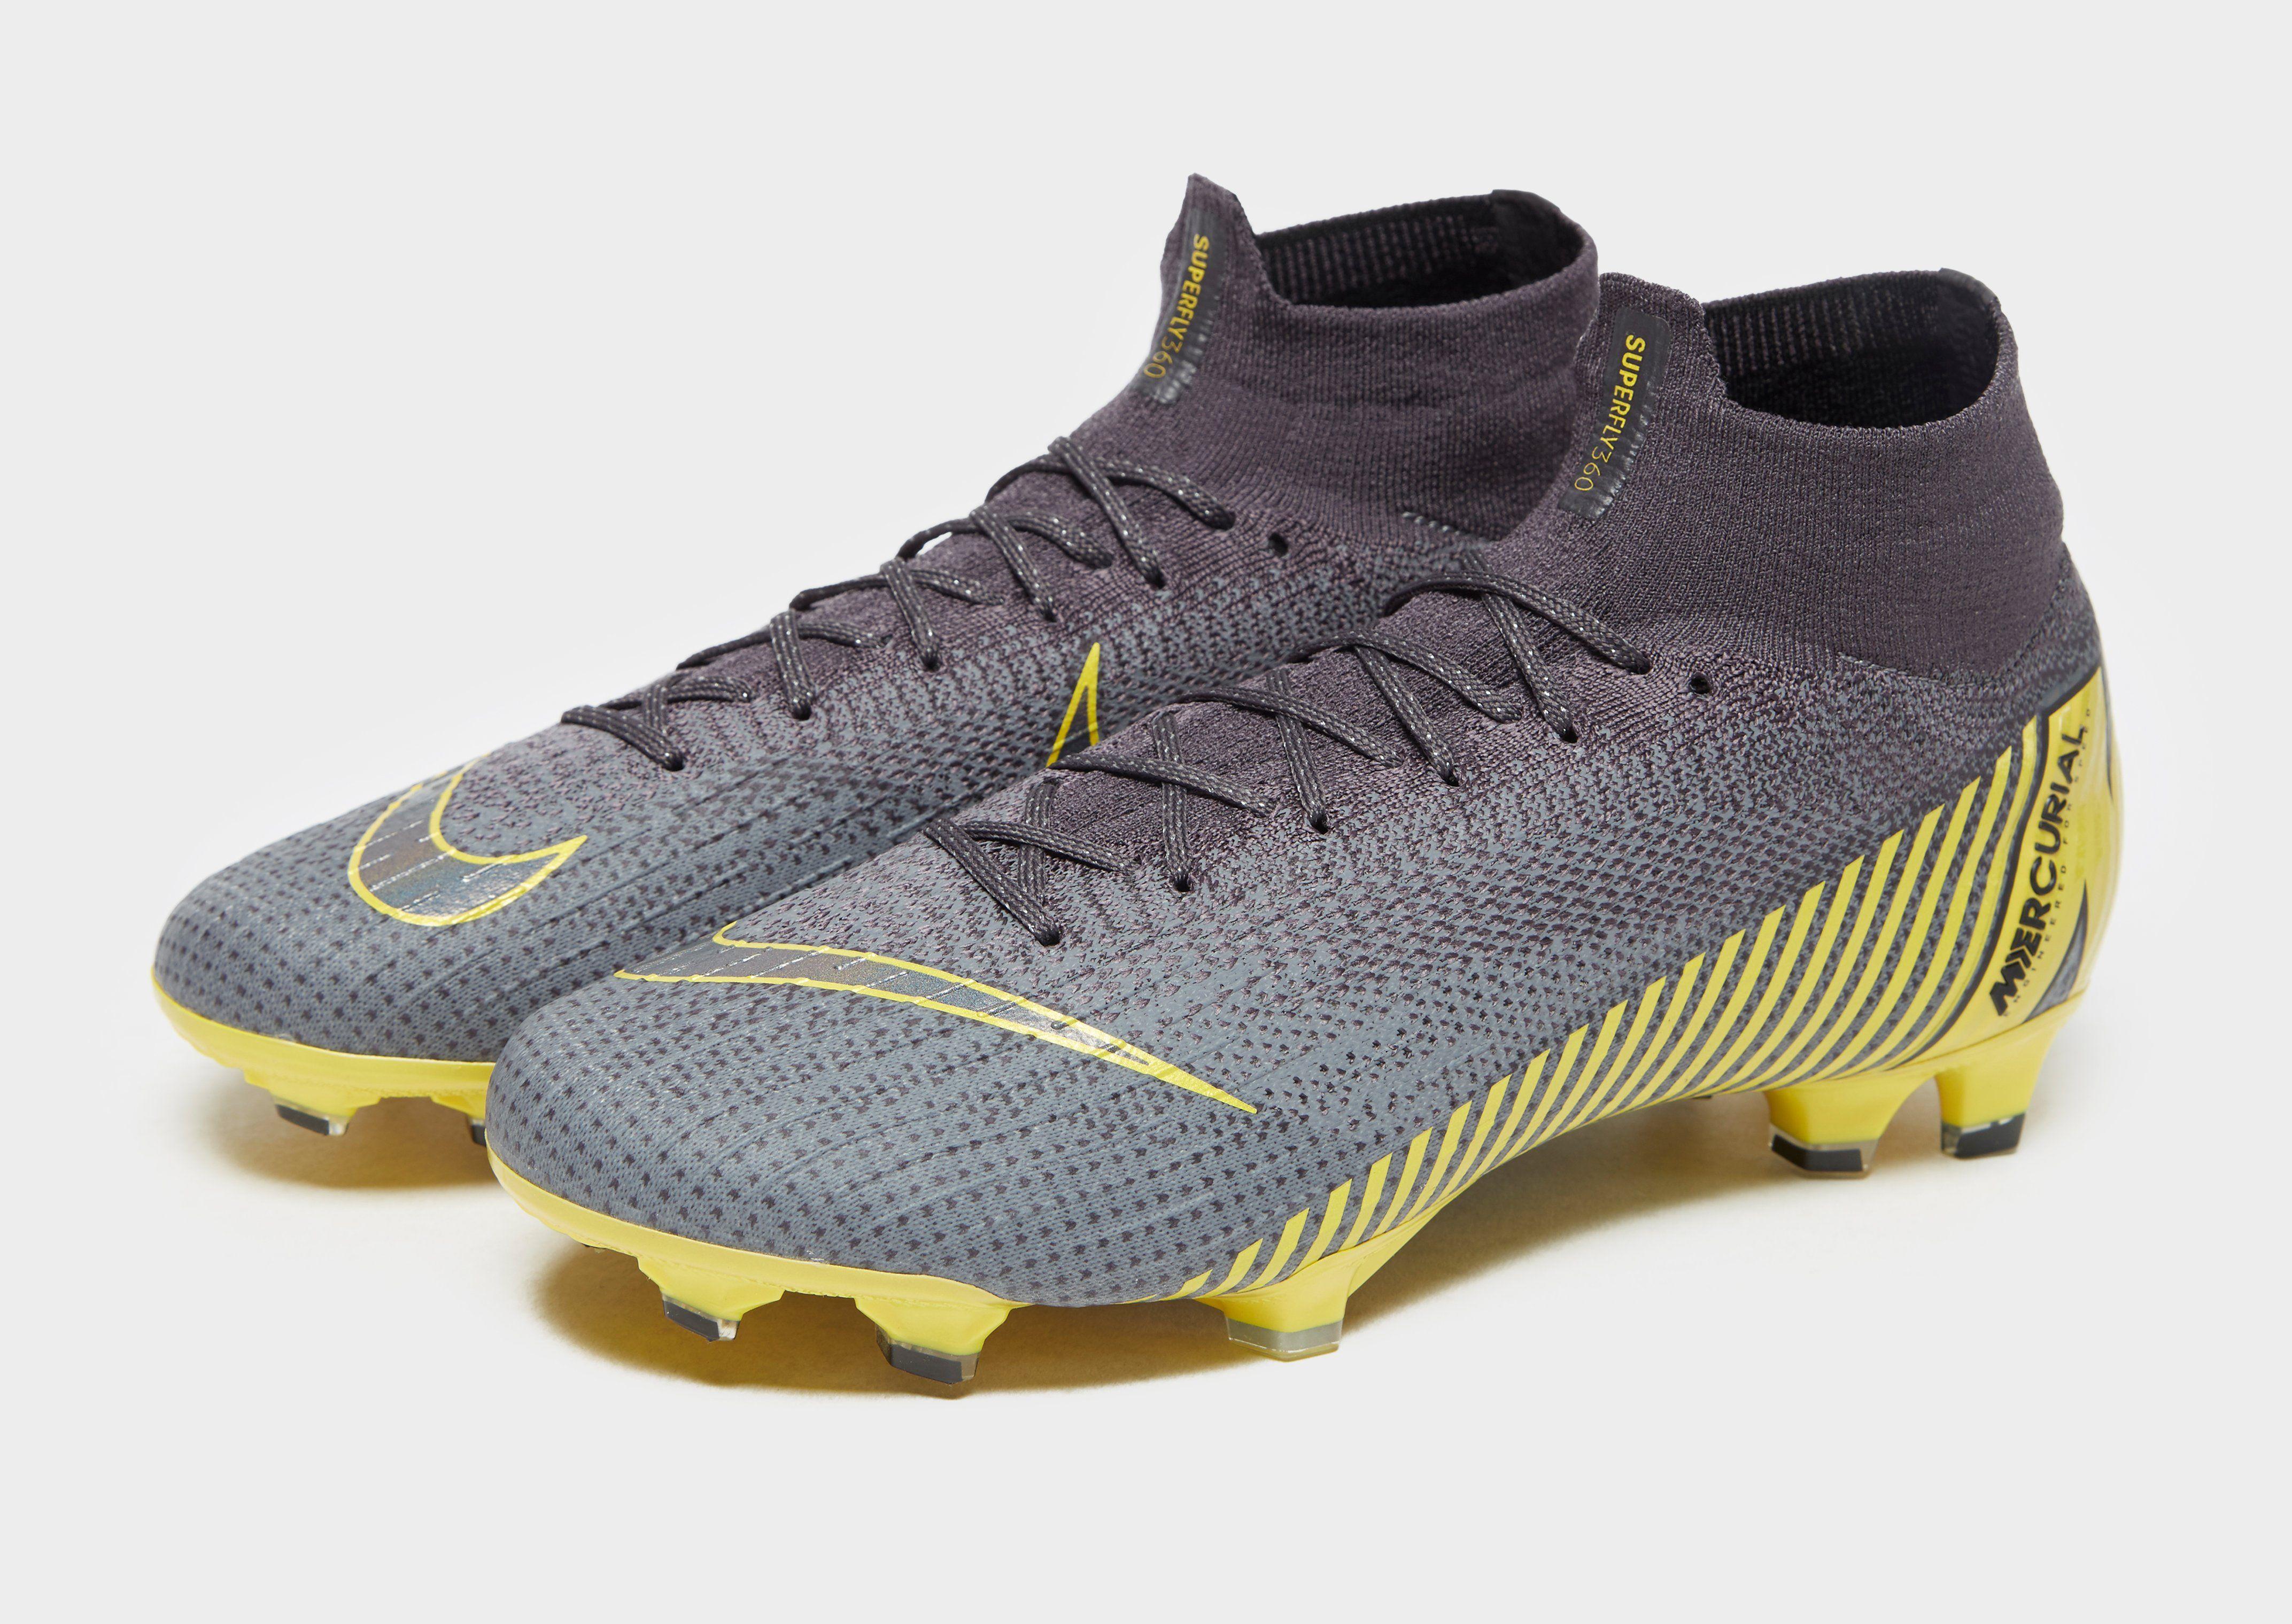 NIKE Nike Superfly 6 Elite FG Firm-Ground Football Boot